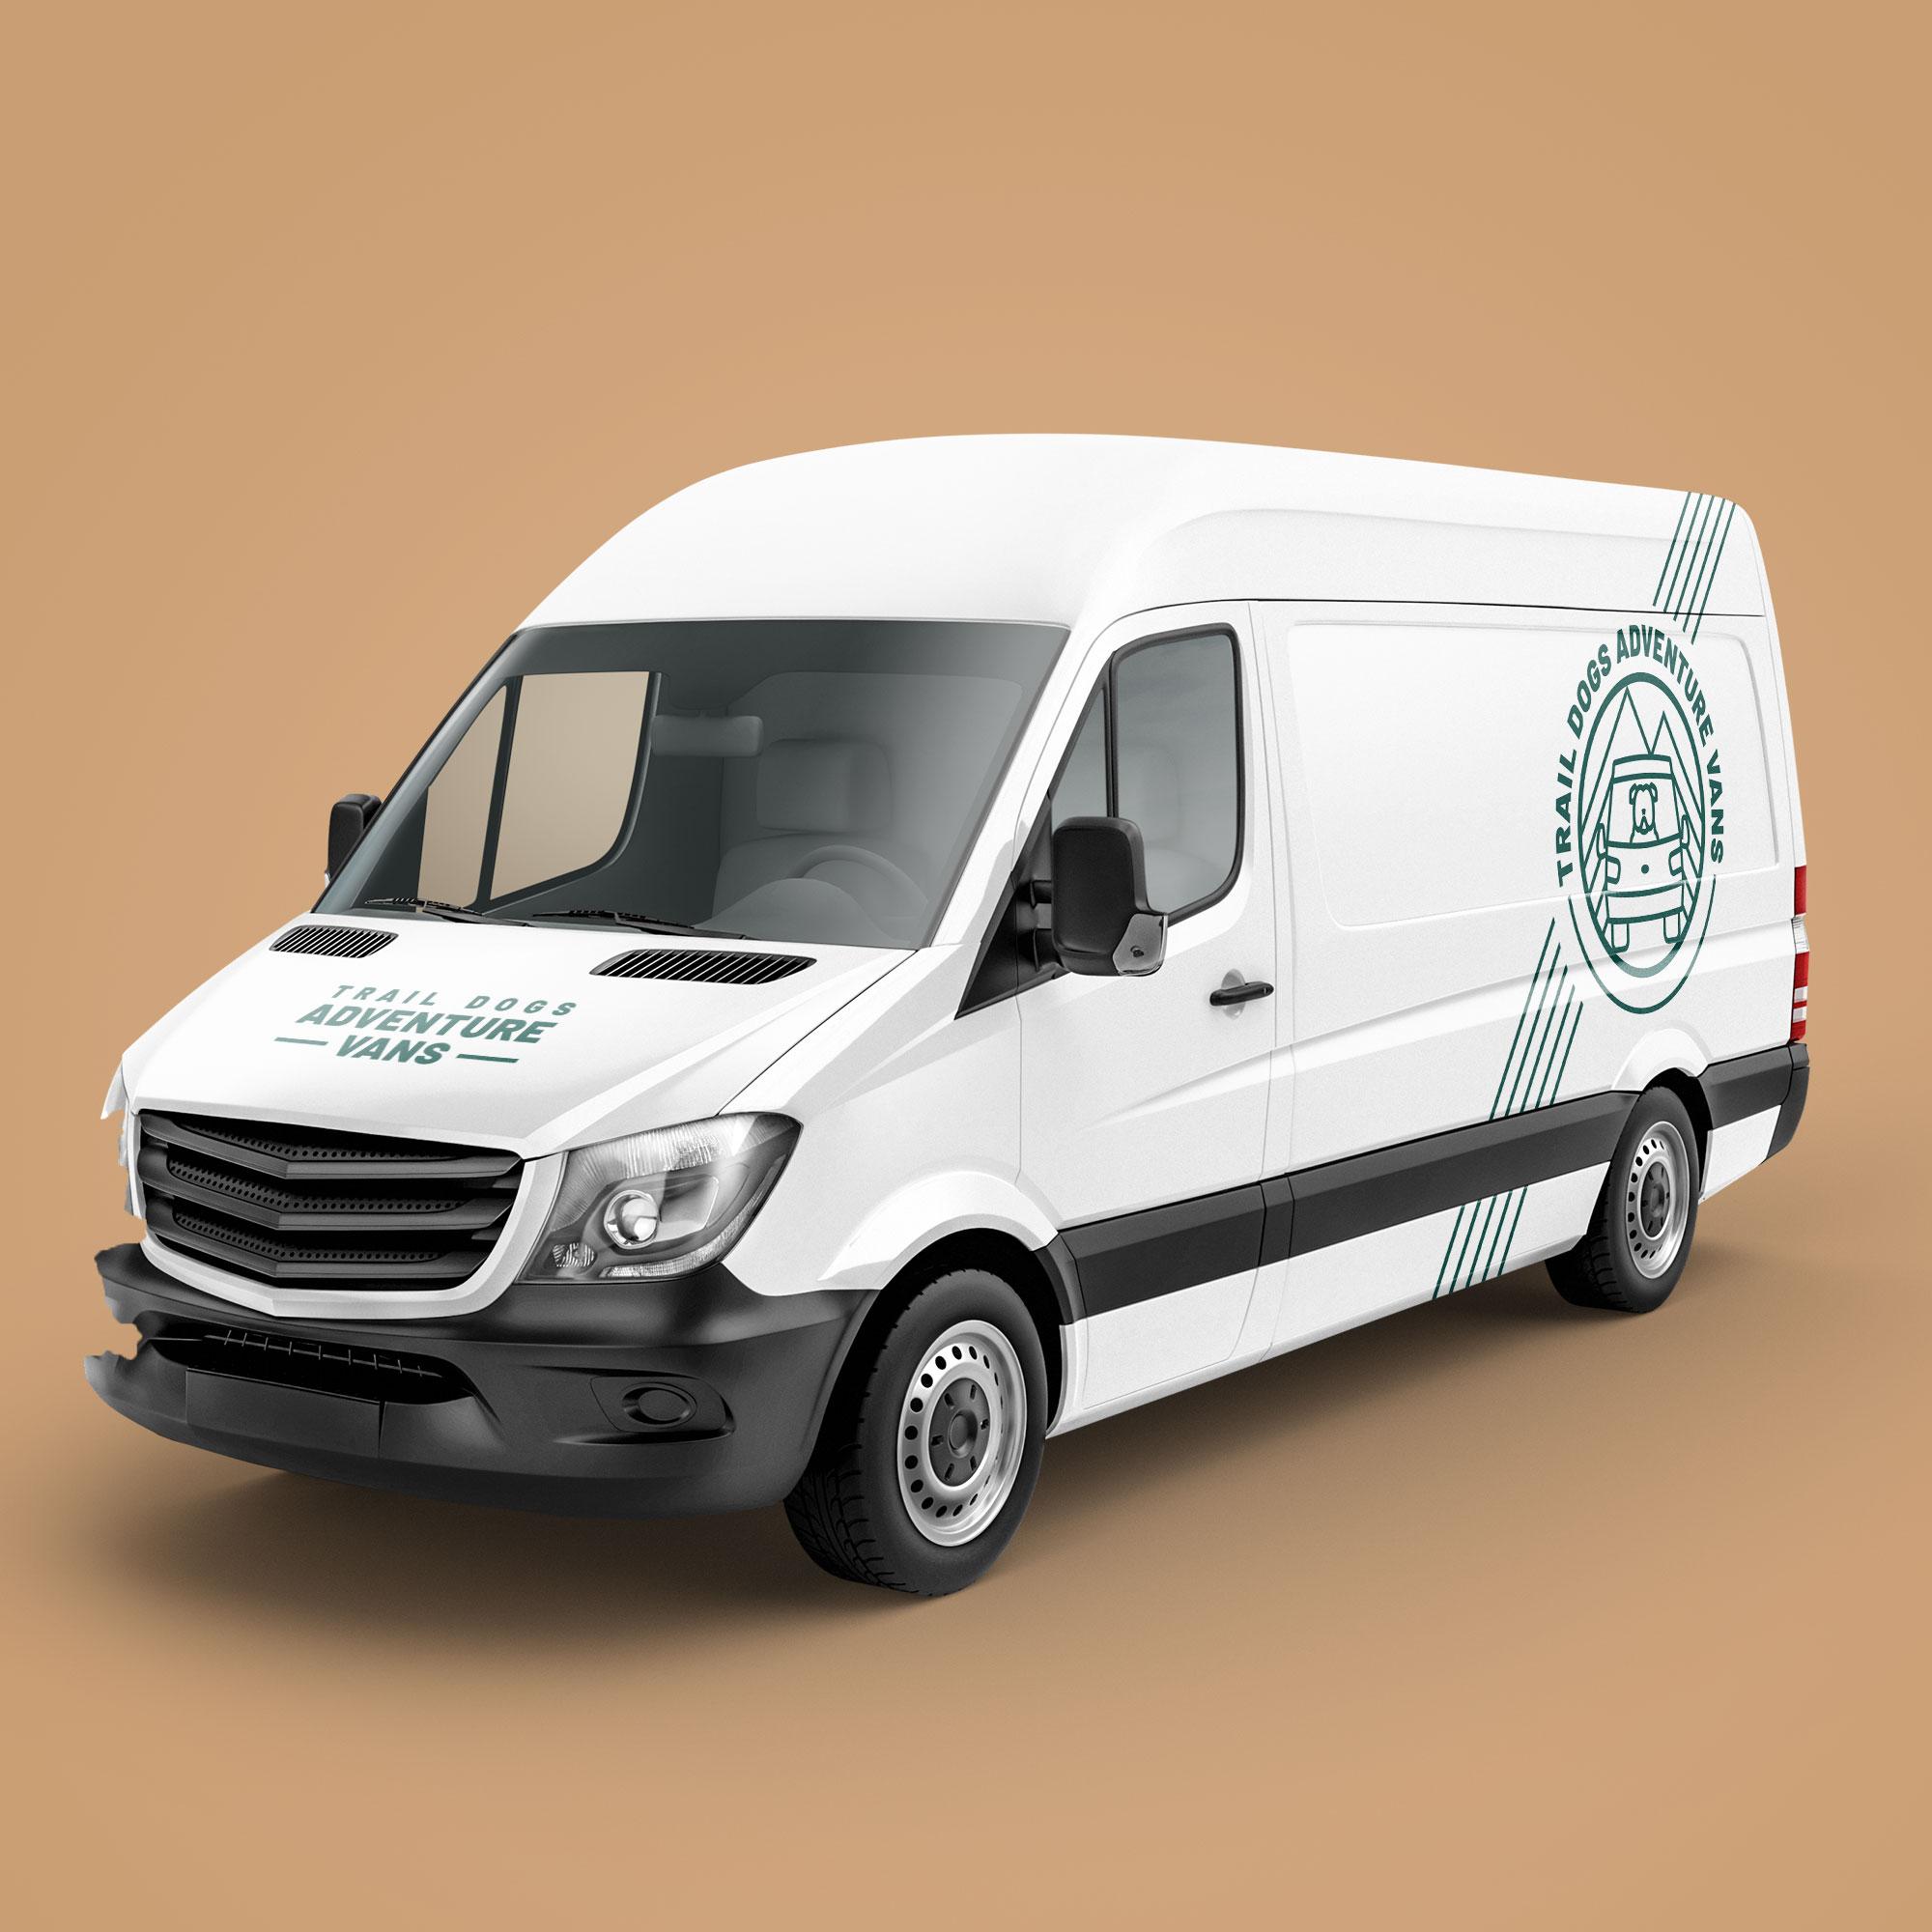 custom van wrap design, camper van company logo, asheville van wraps